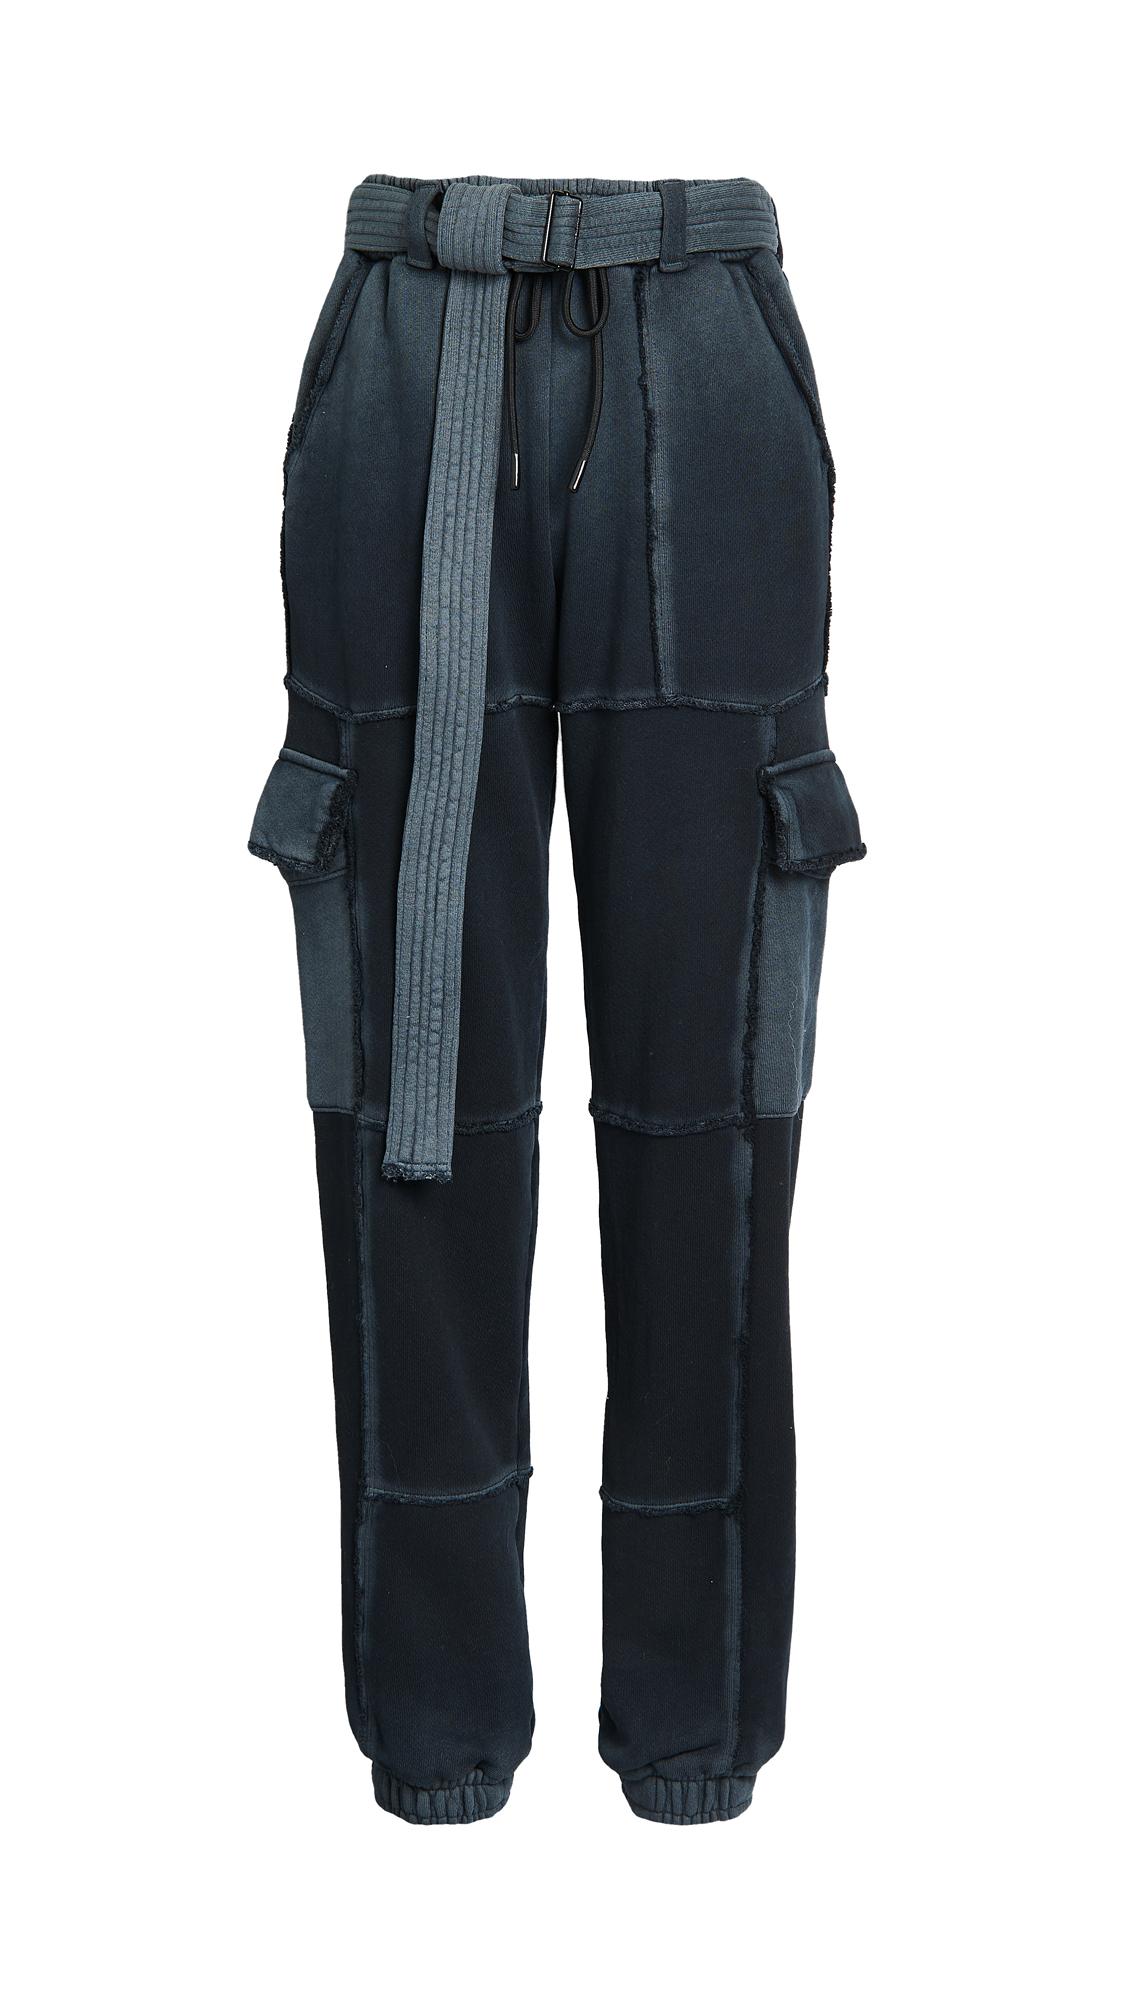 Cotton Citizen Brooklyn Cargo Pants